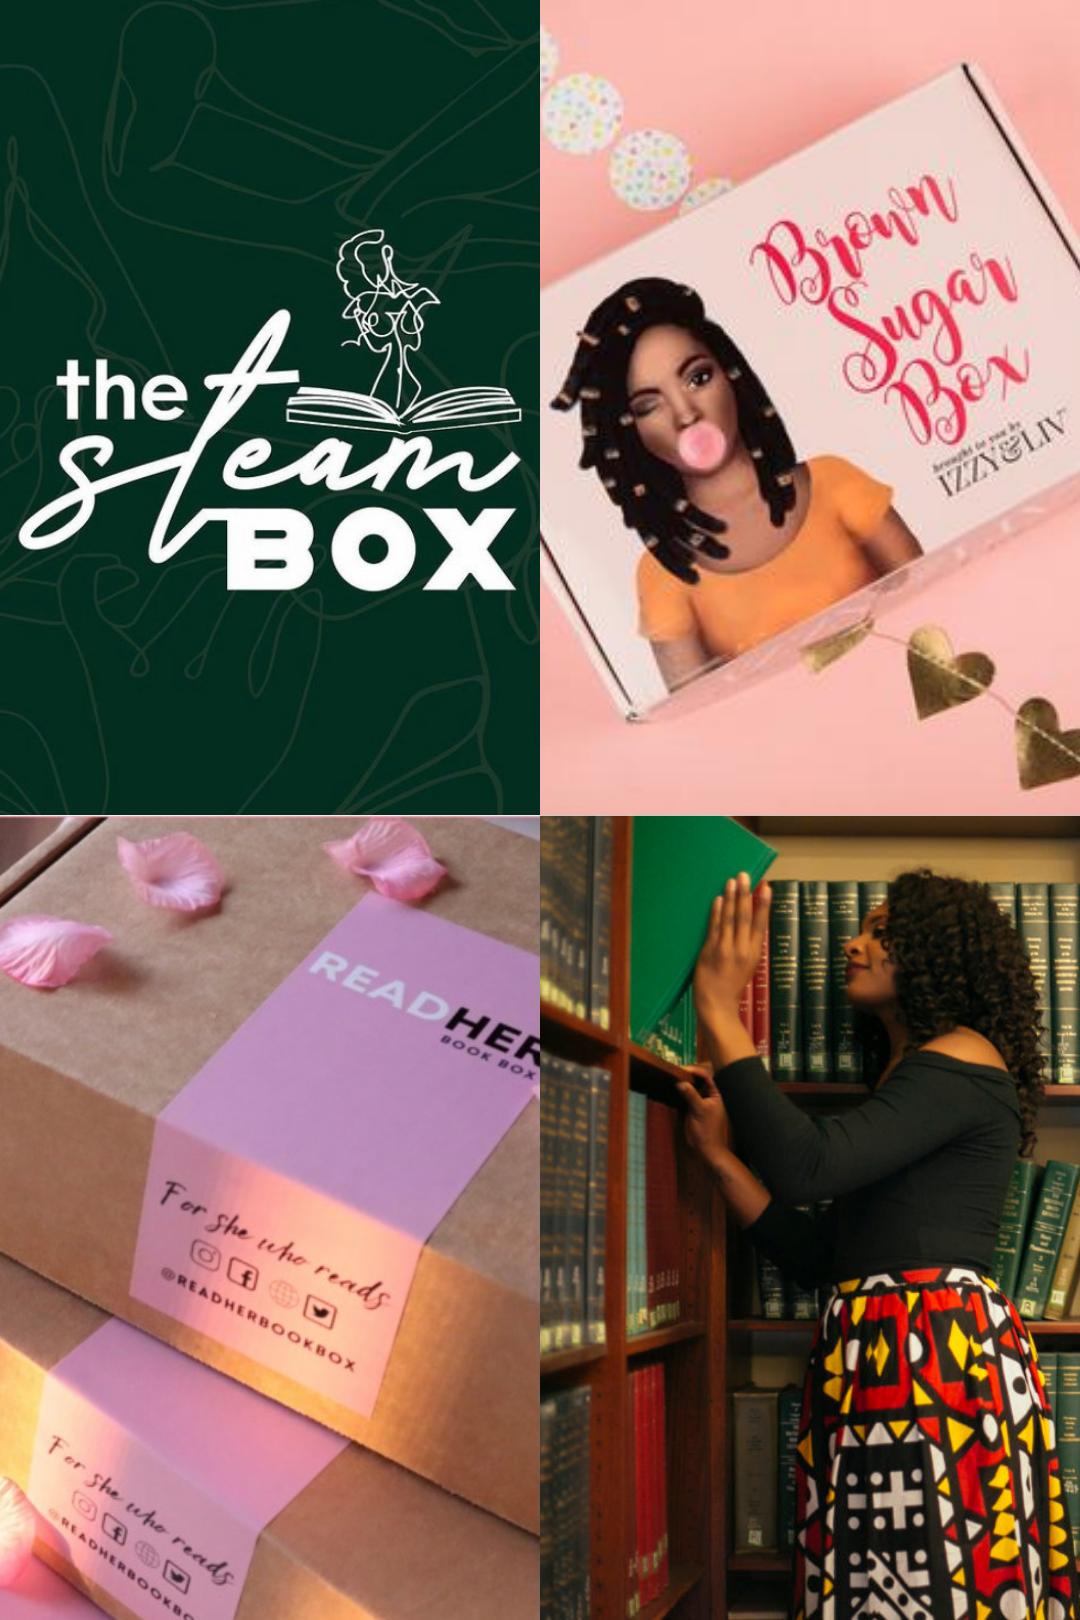 List #3 –  When that Stimmy check means treat yo' self to books!